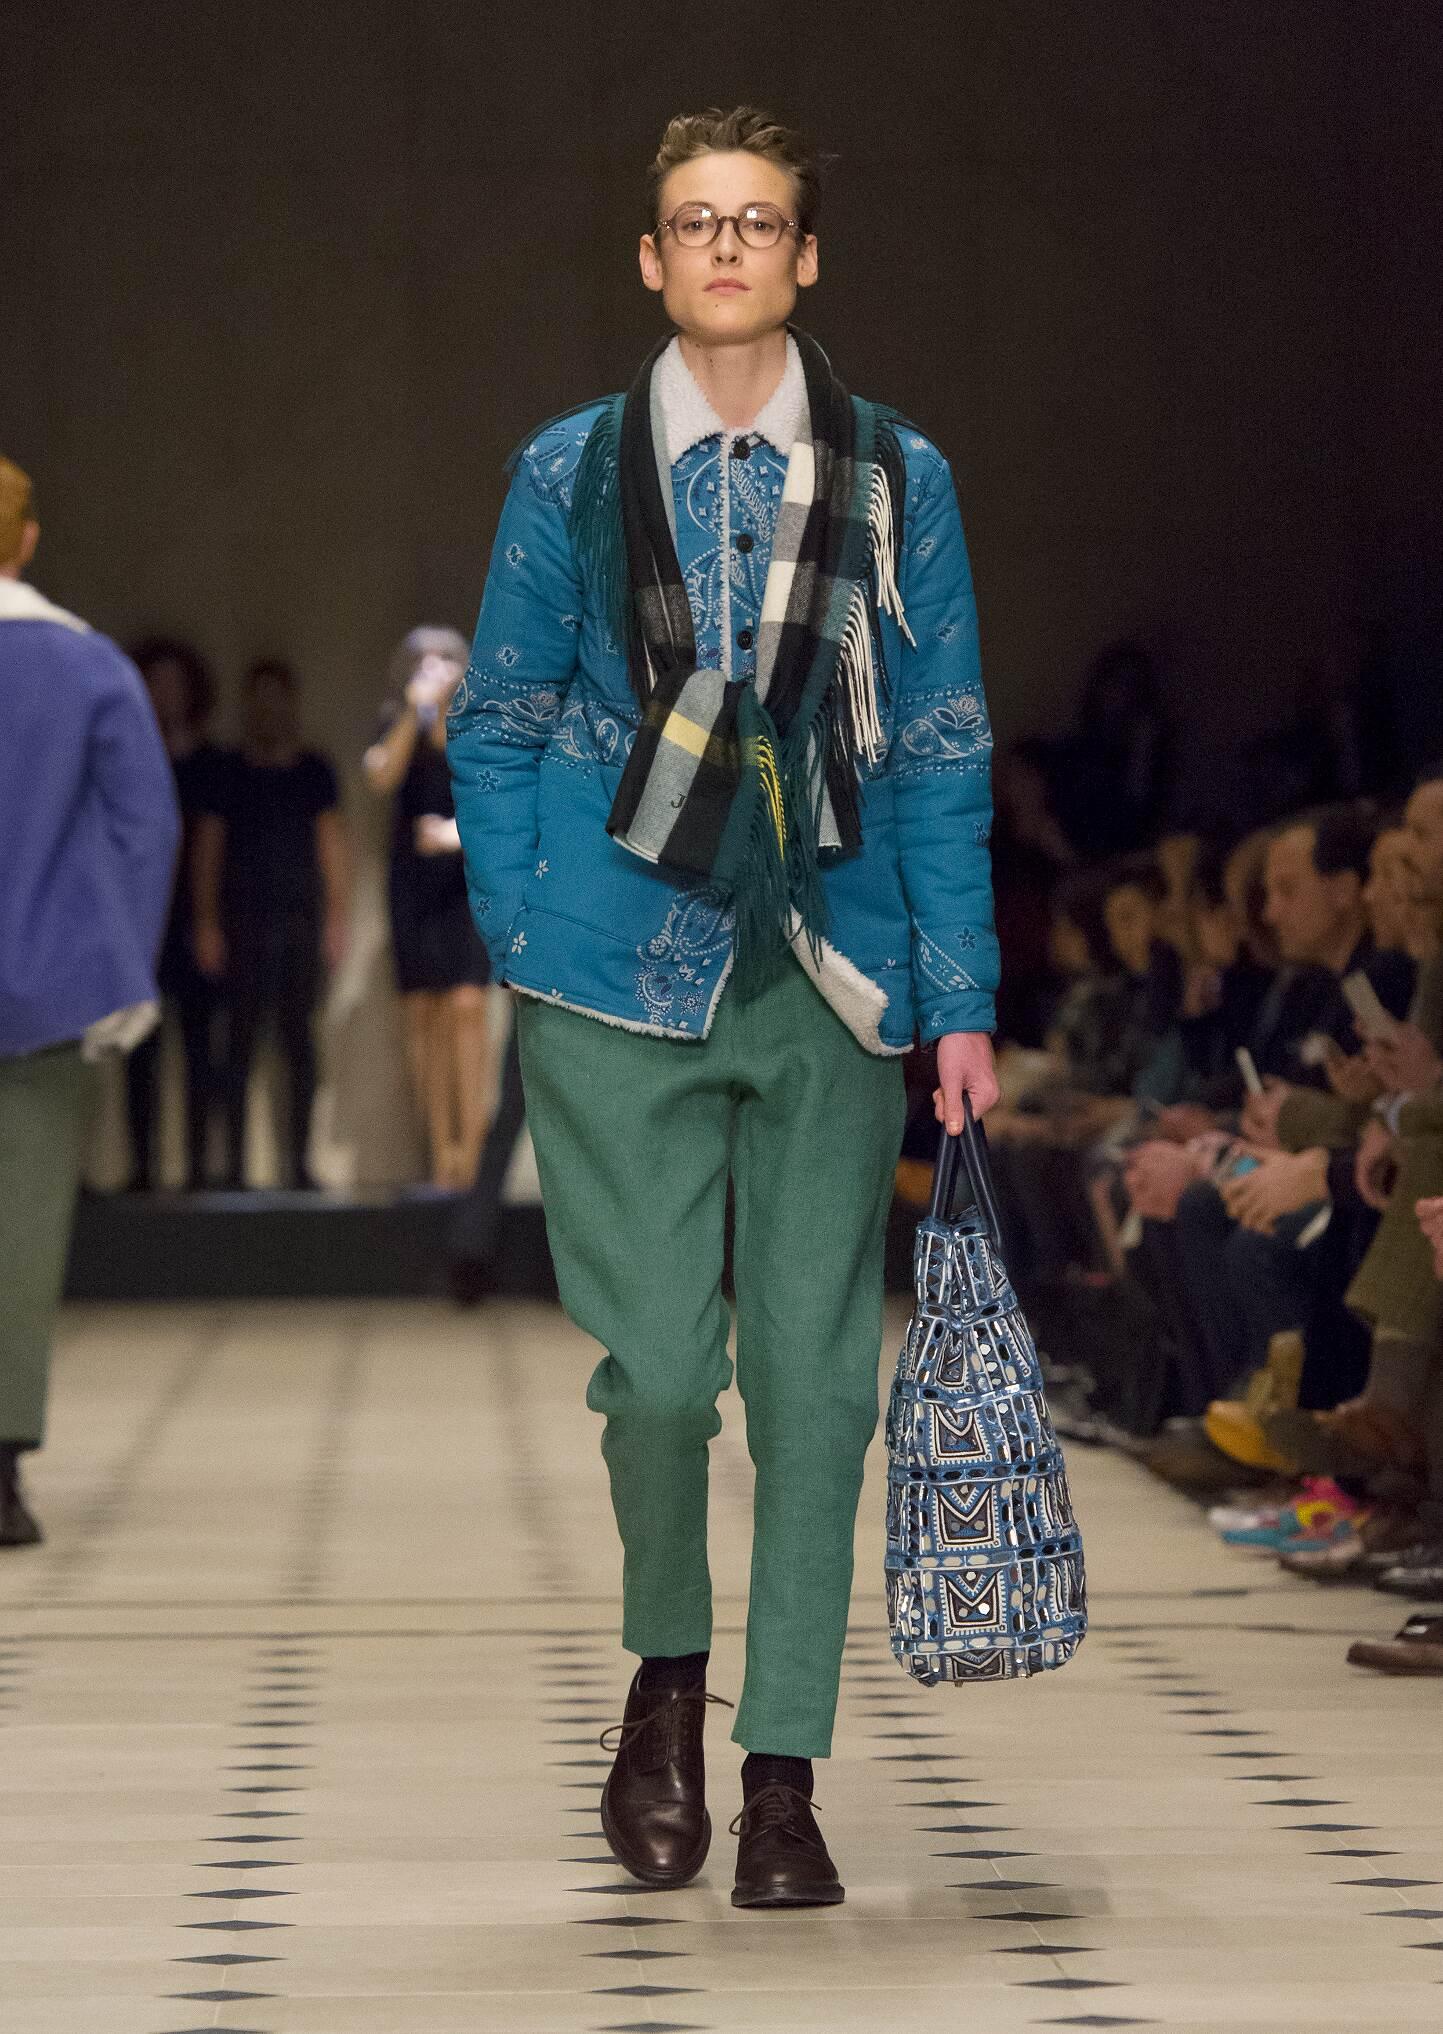 Runway Burberry Prorsum Fall Winter 2015 Men's Collection London Fashion Week